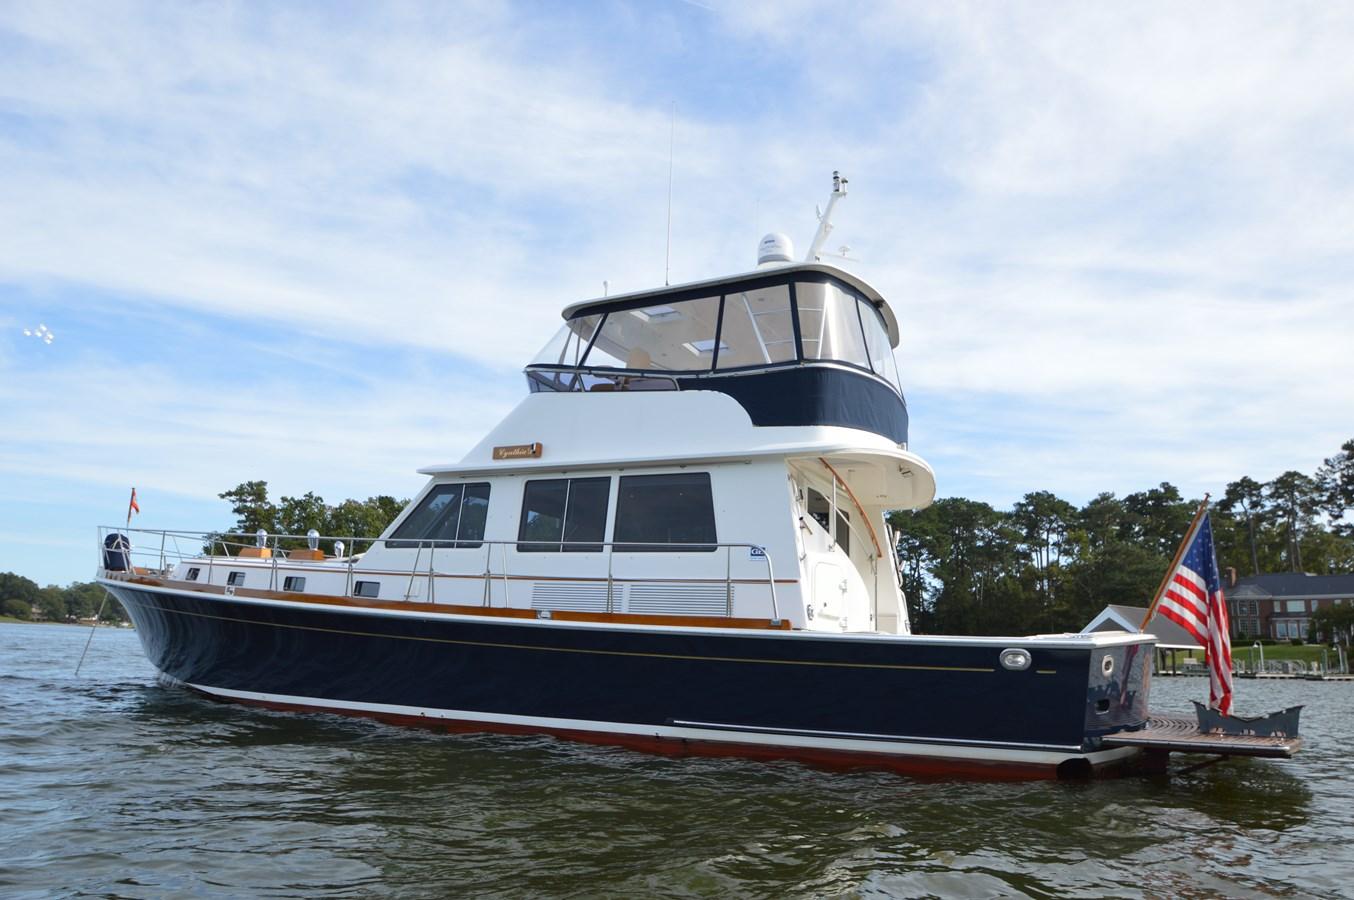 5 2004 GRAND BANKS 58 Eastbay Motor Yacht 2713346